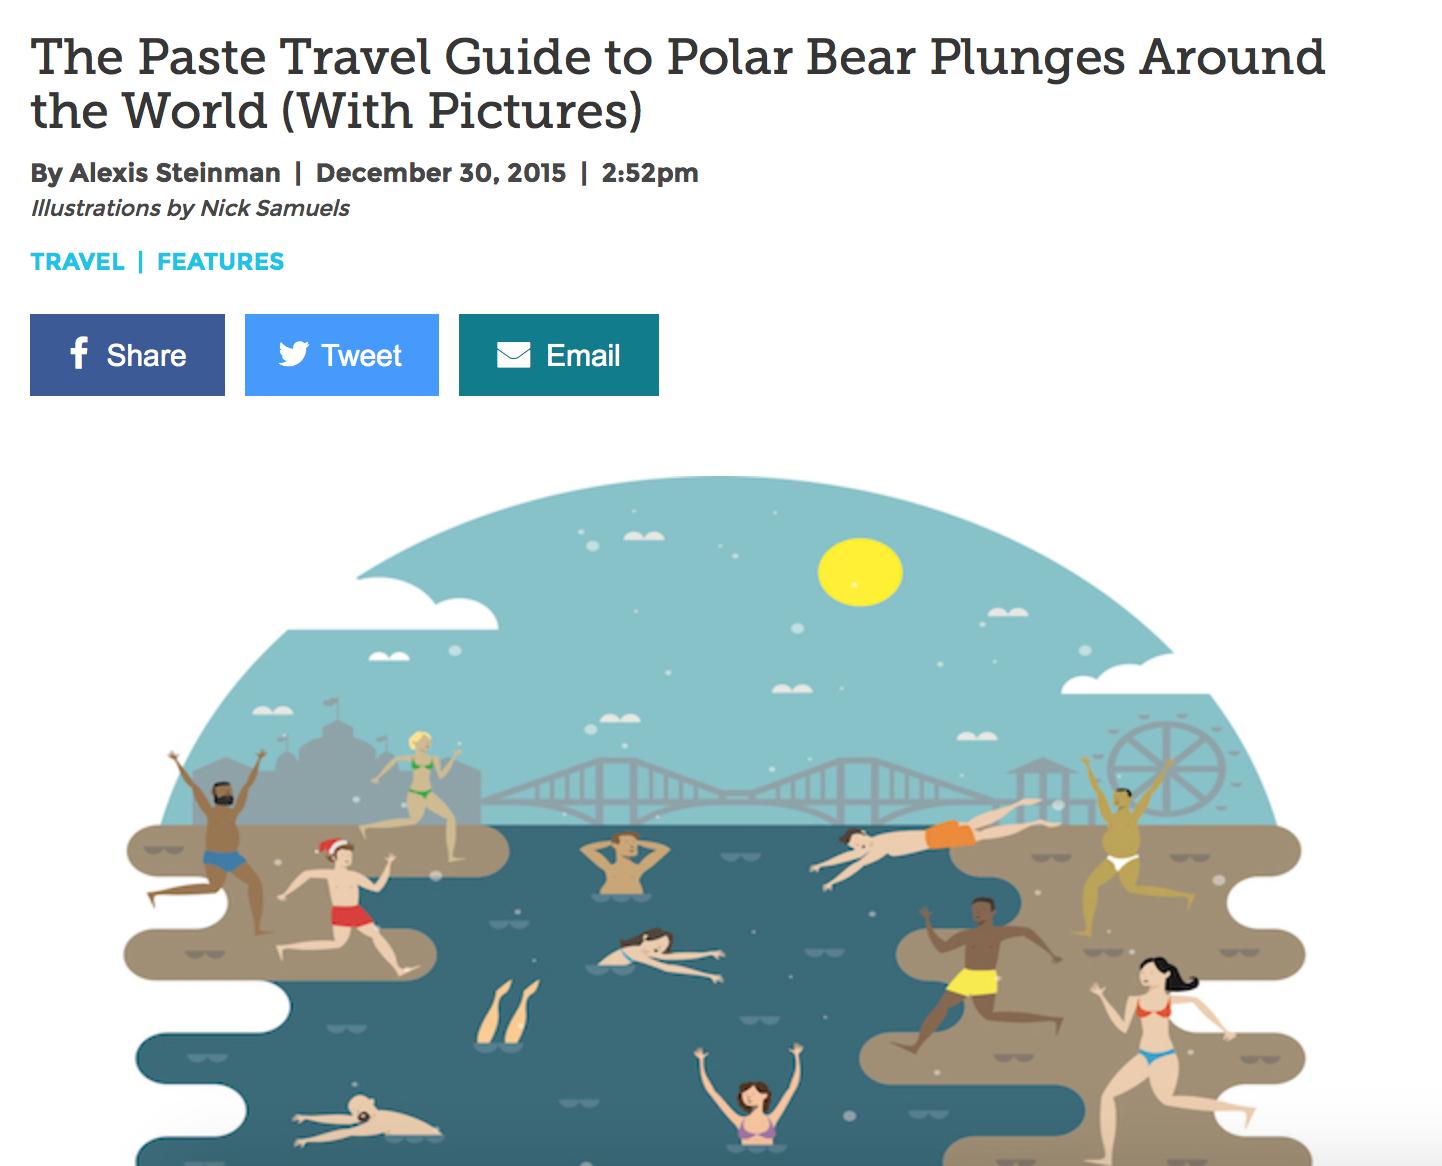 Polar Bear Plunges Around The World